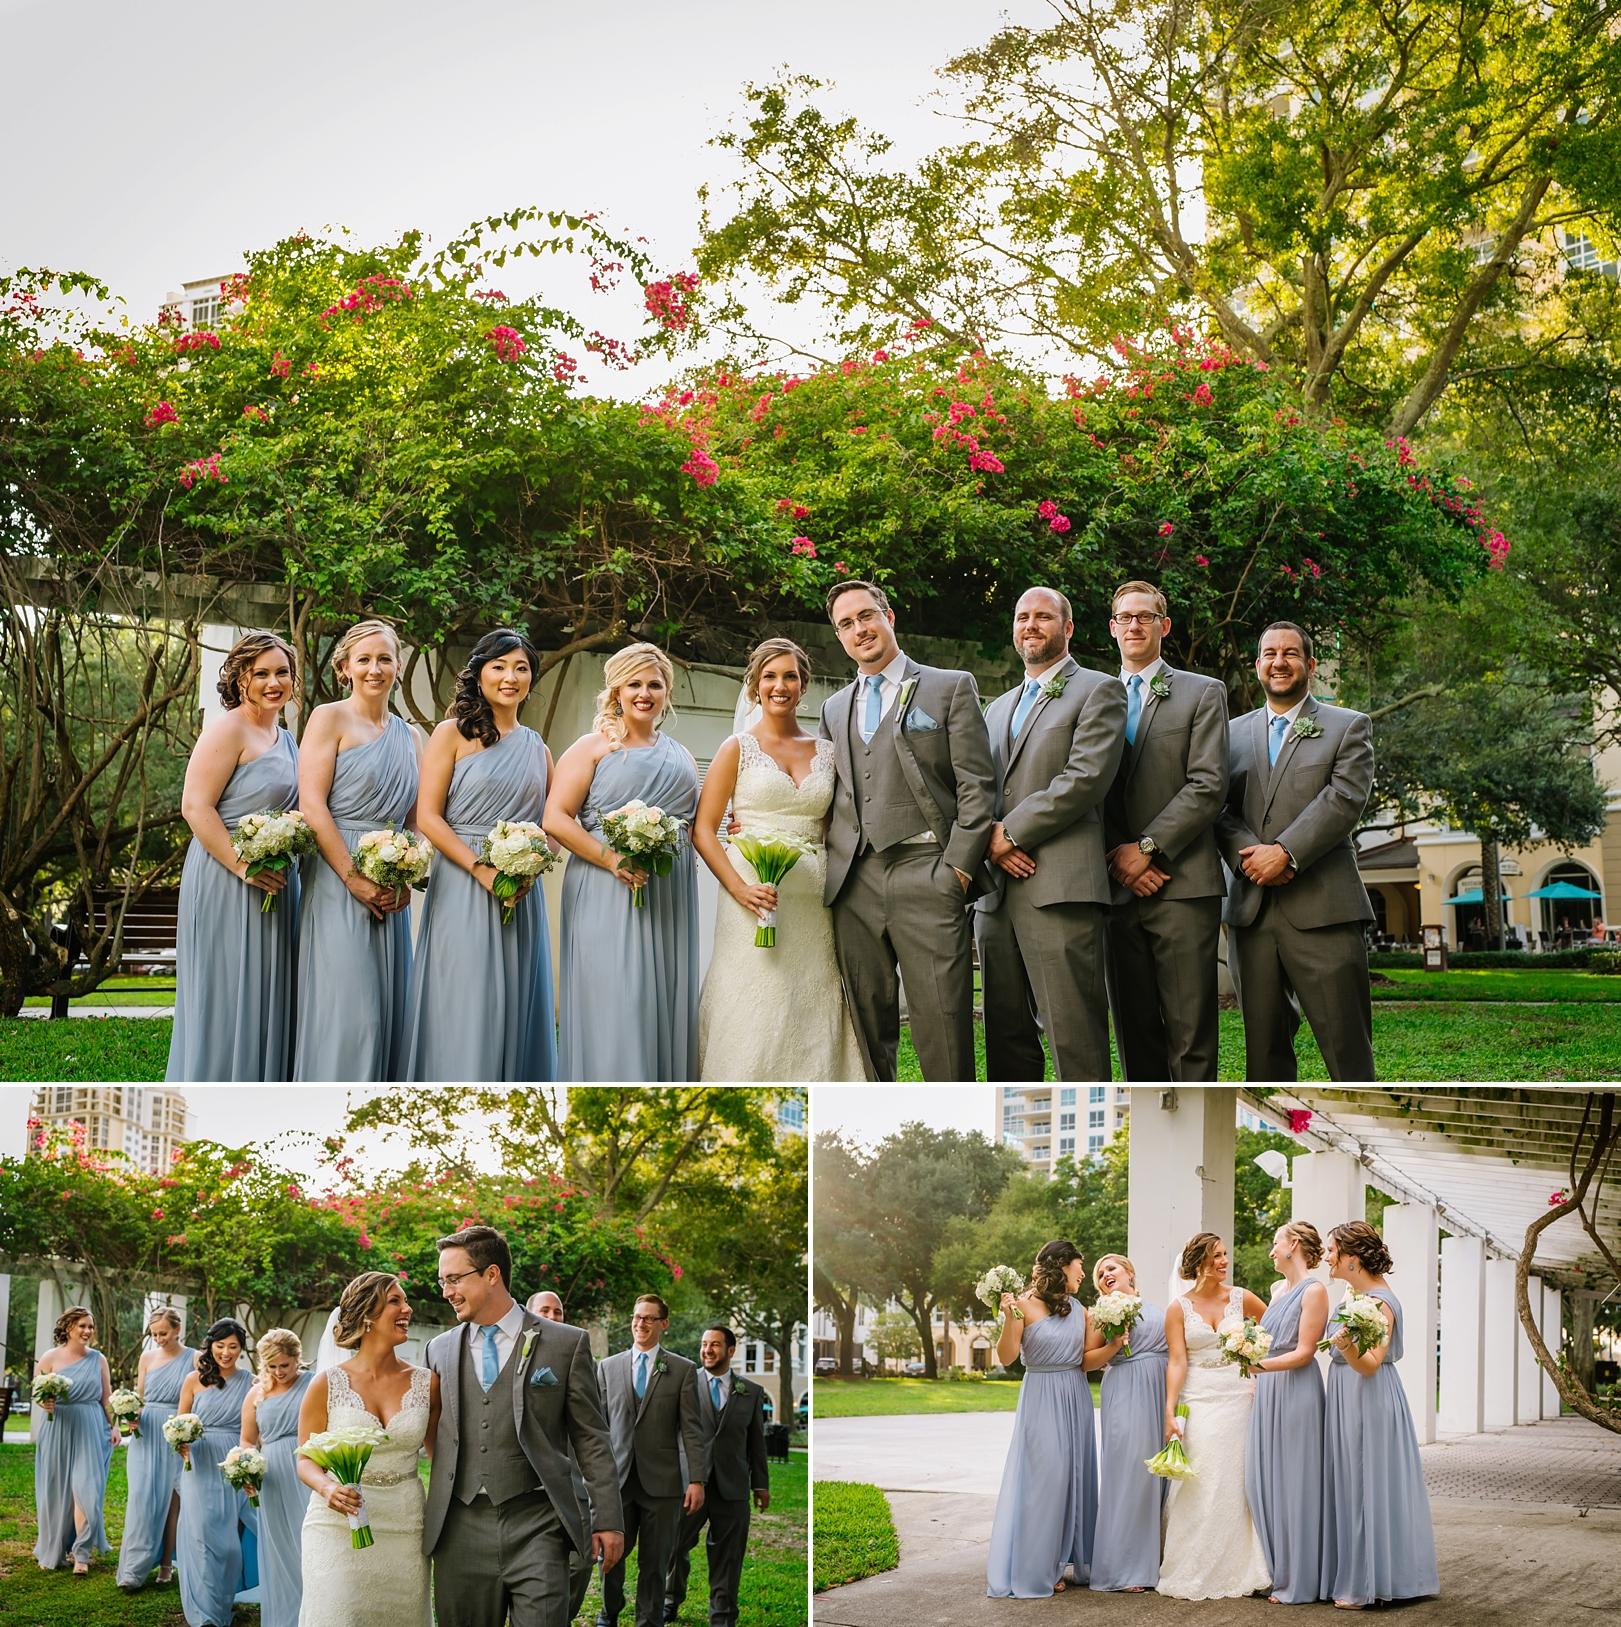 st-pete-art-museum-wedding-vinoy-ashlee-hamon-photography_0010.jpg